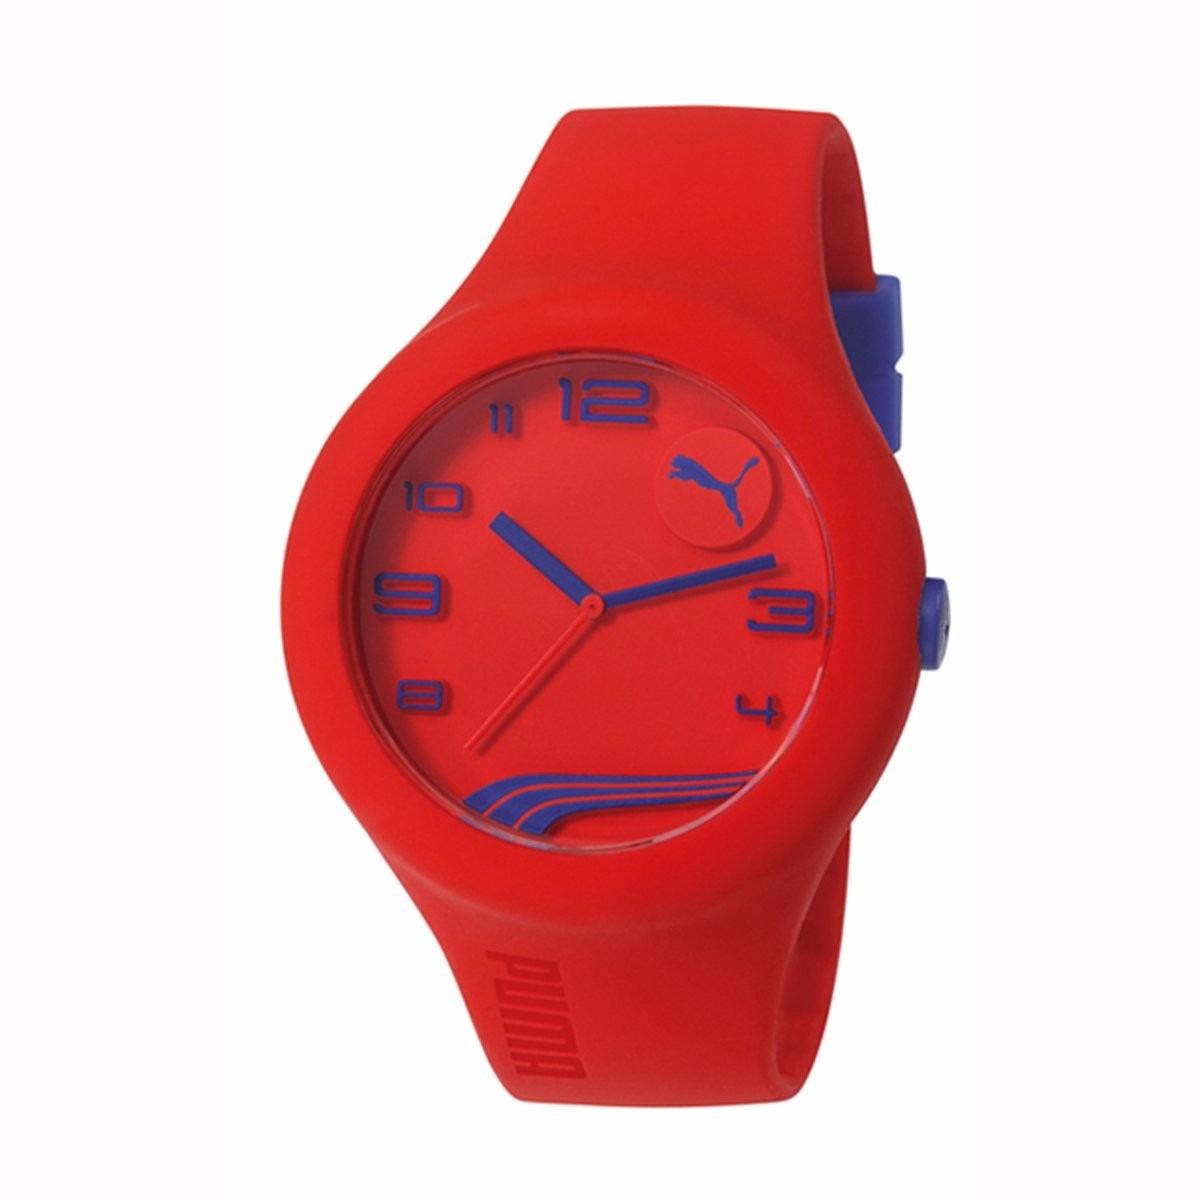 Reloj Puma Pu103211022 Unisex. Envio Gratis -   2.173 d735cfb6f5d0